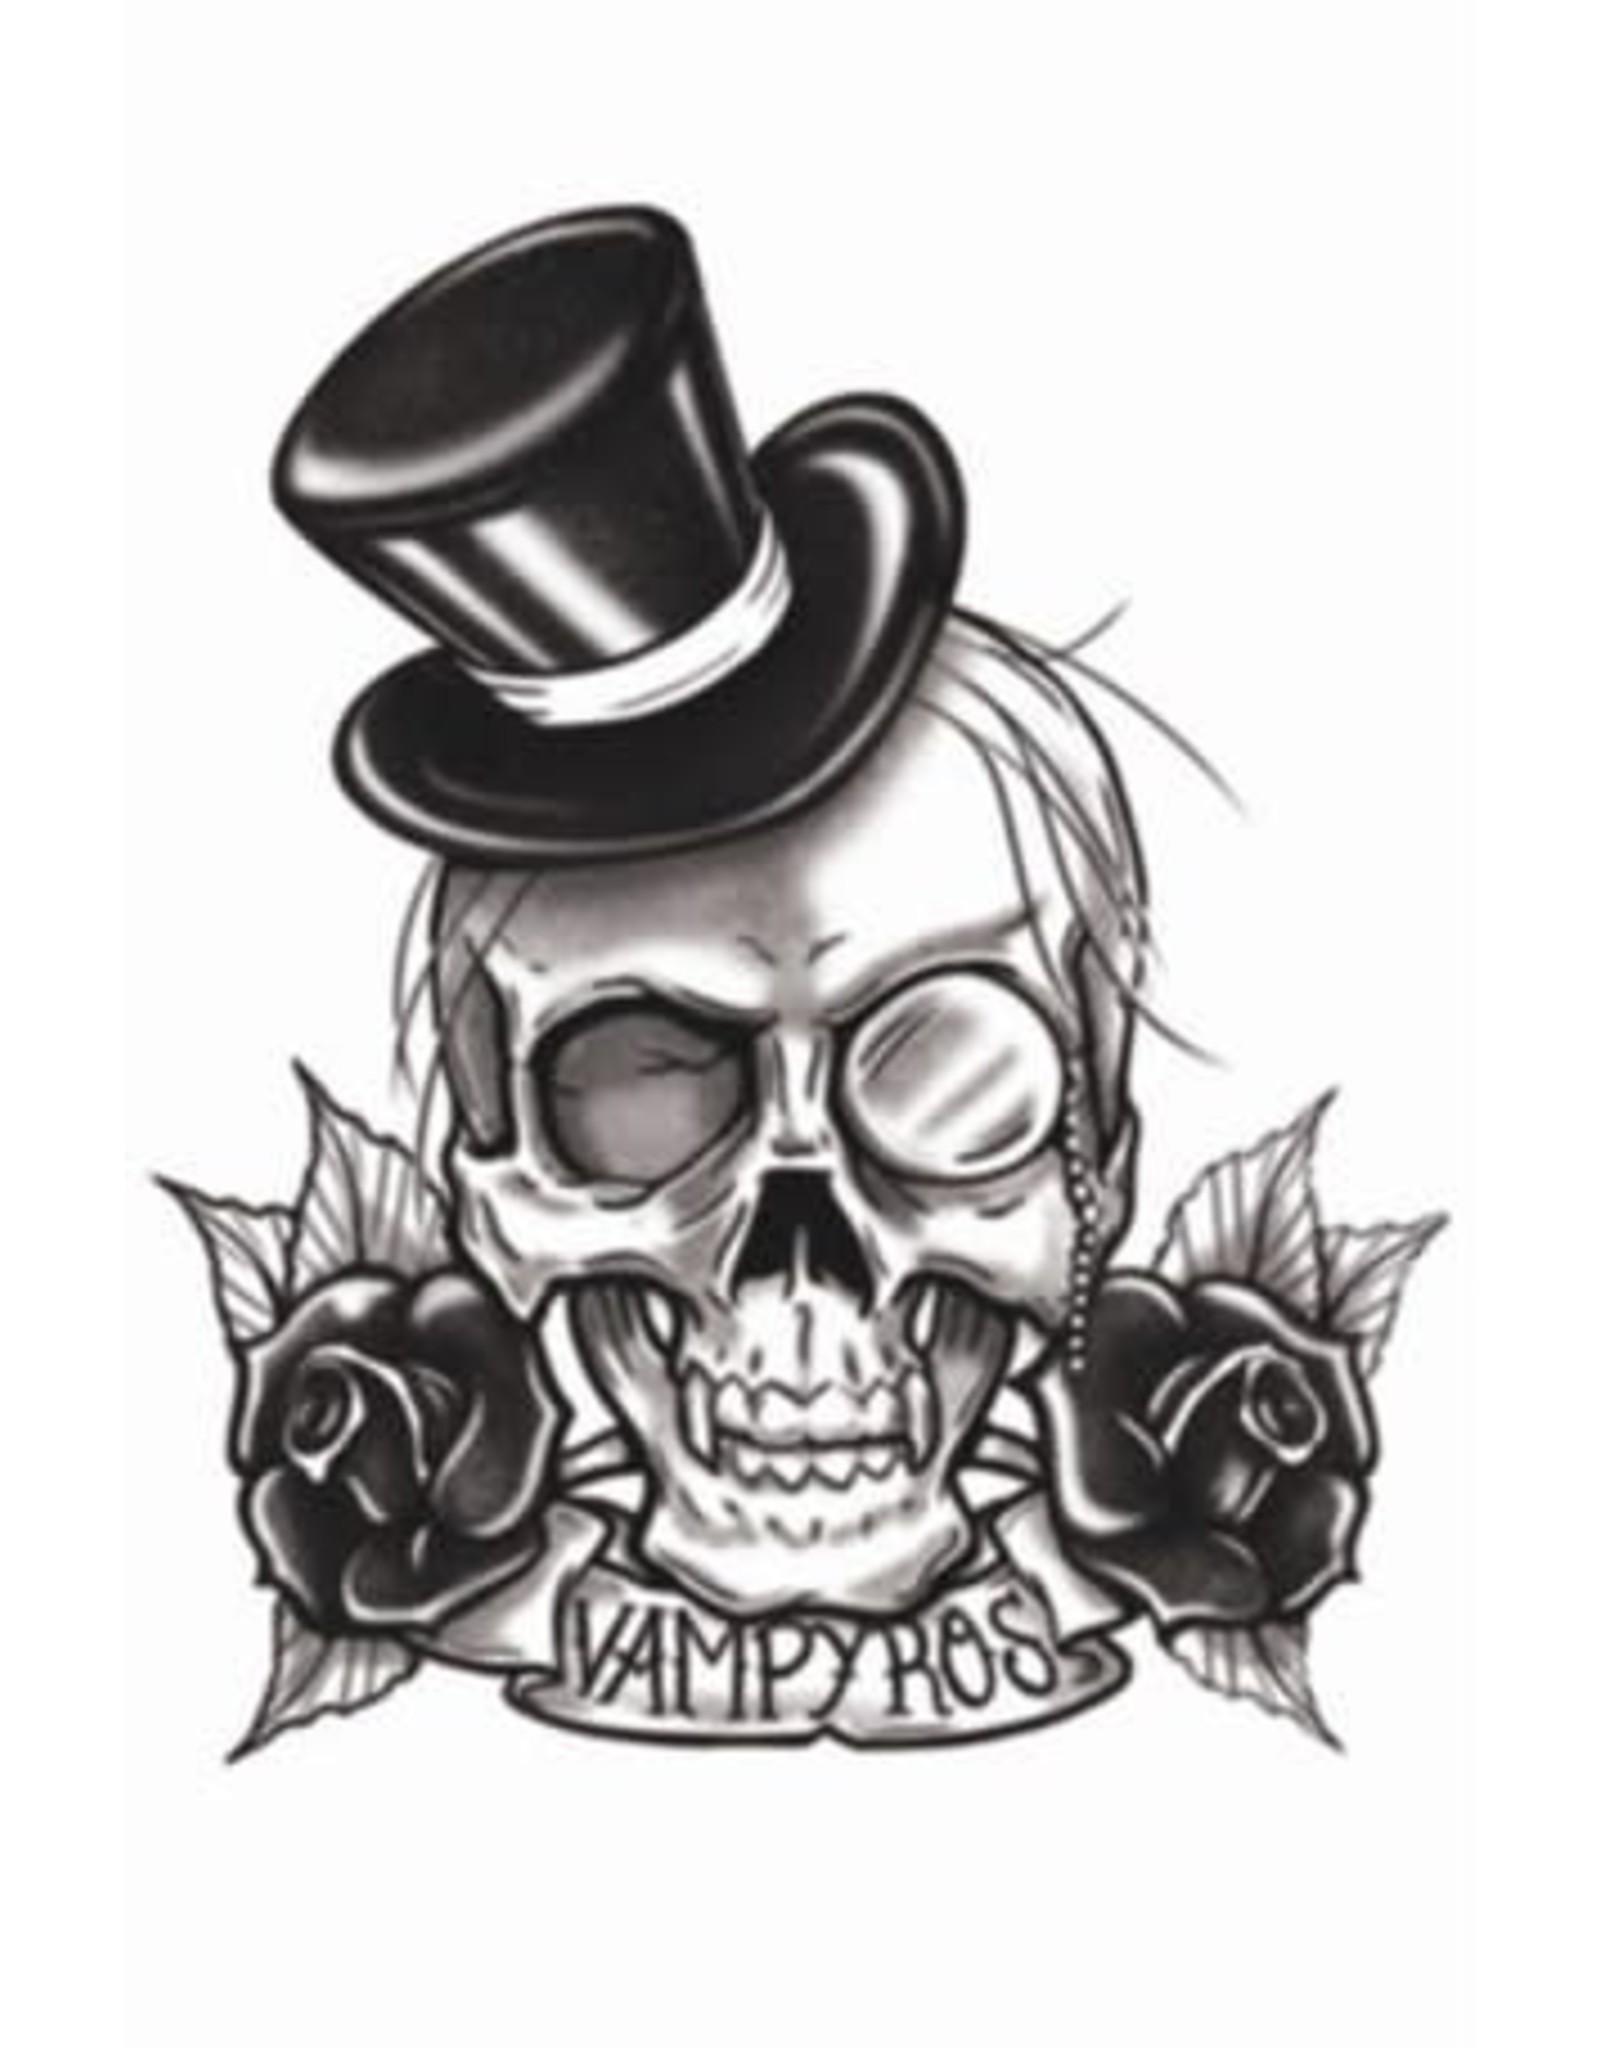 Tinsley Transfers Goth Vampyros Tattoo